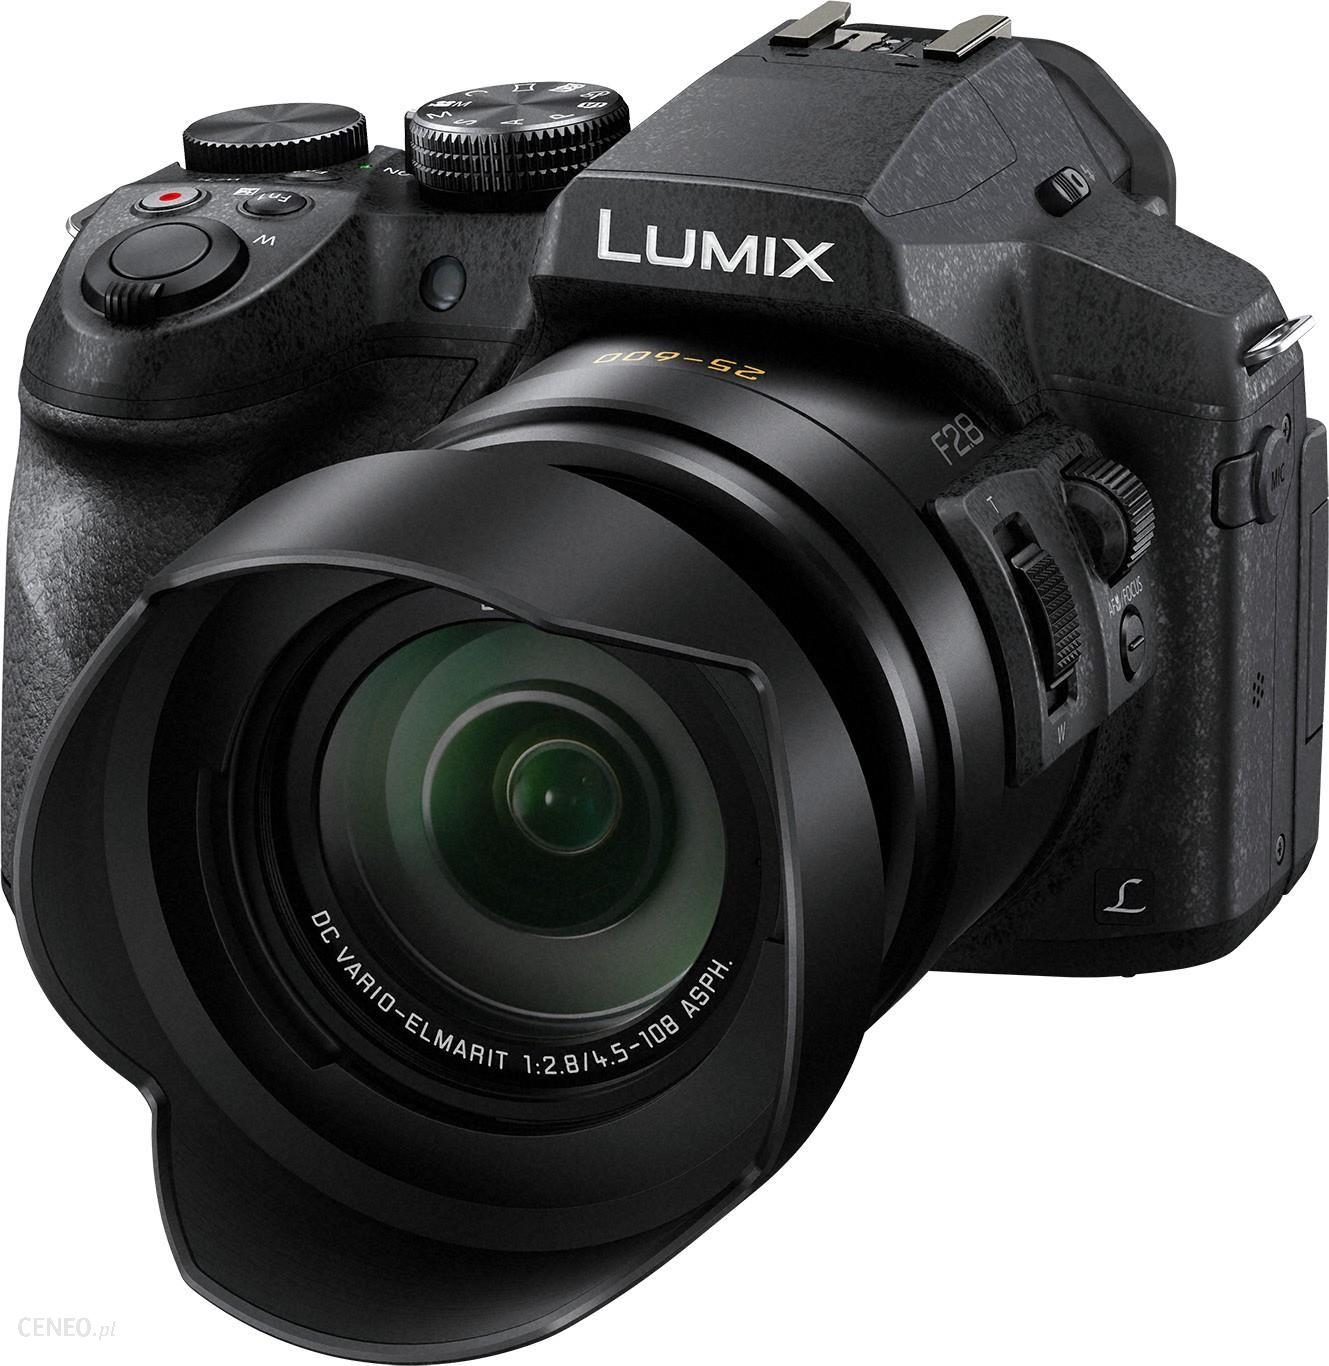 Aparat Cyfrowy Panasonic Lumix DMC-FZ300 Czarny